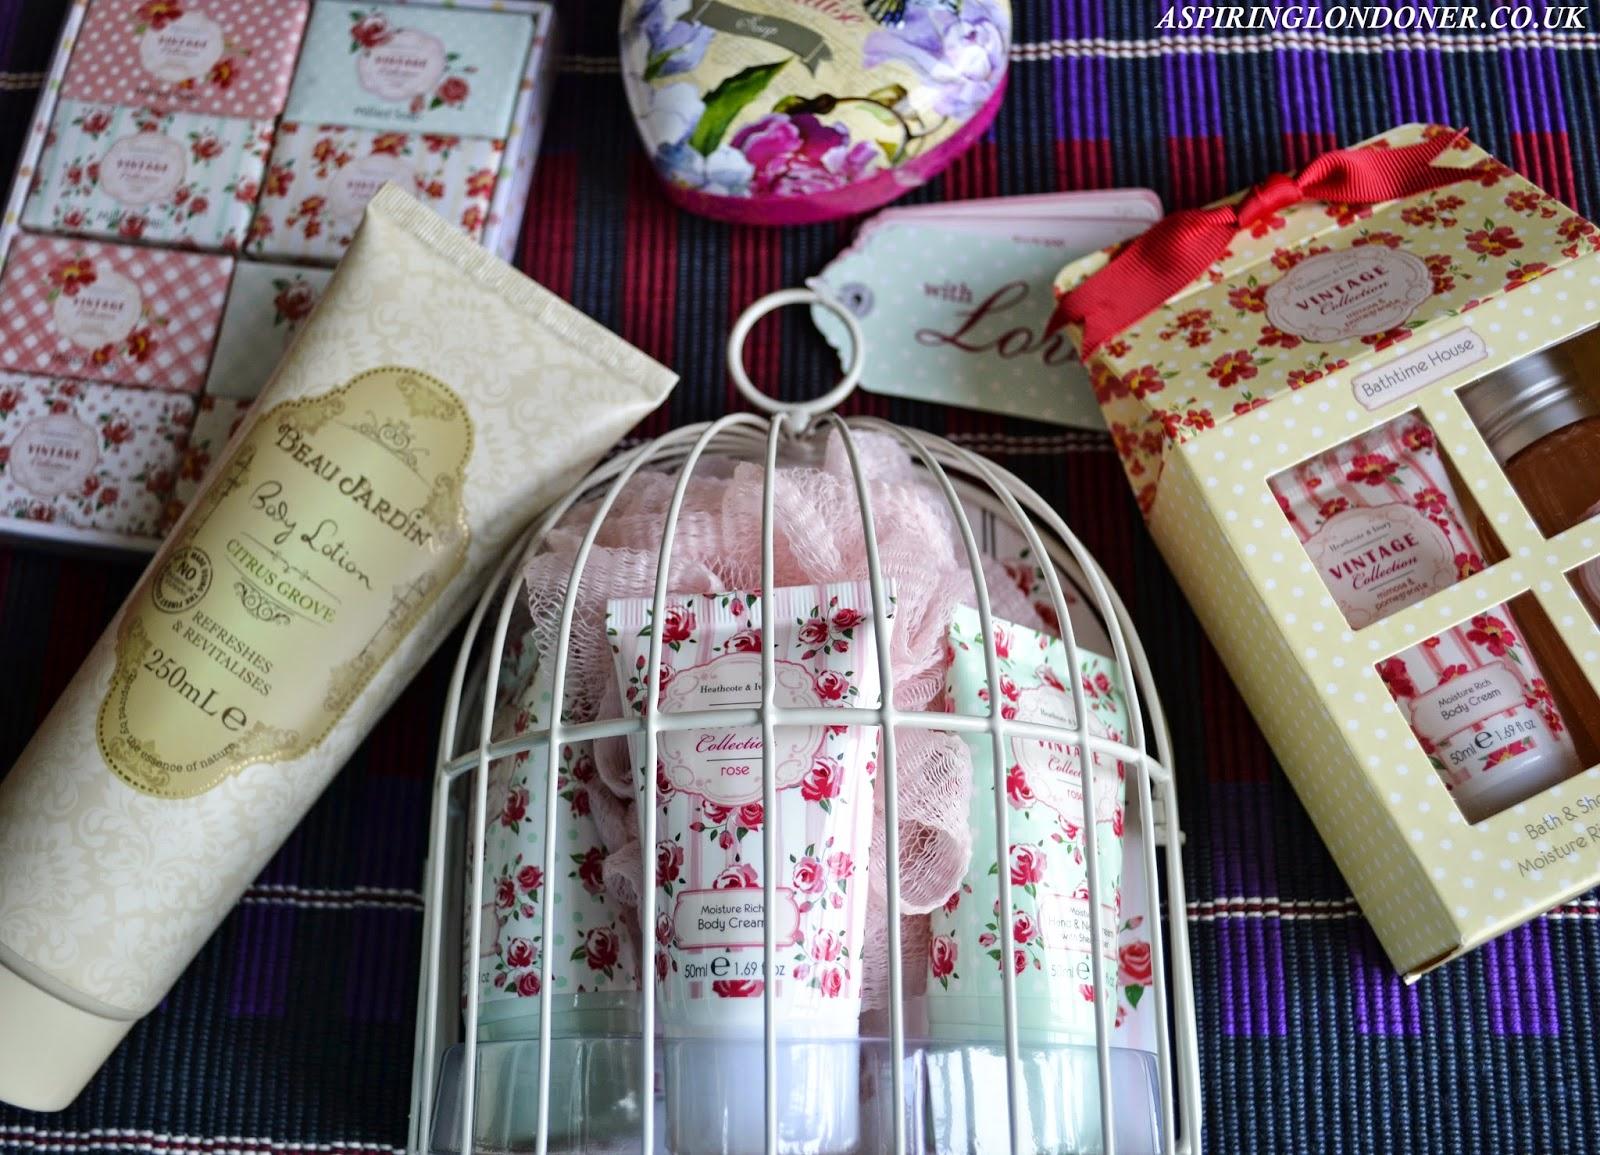 Heathcote & Ivory Gift Products - Aspiring Londoner